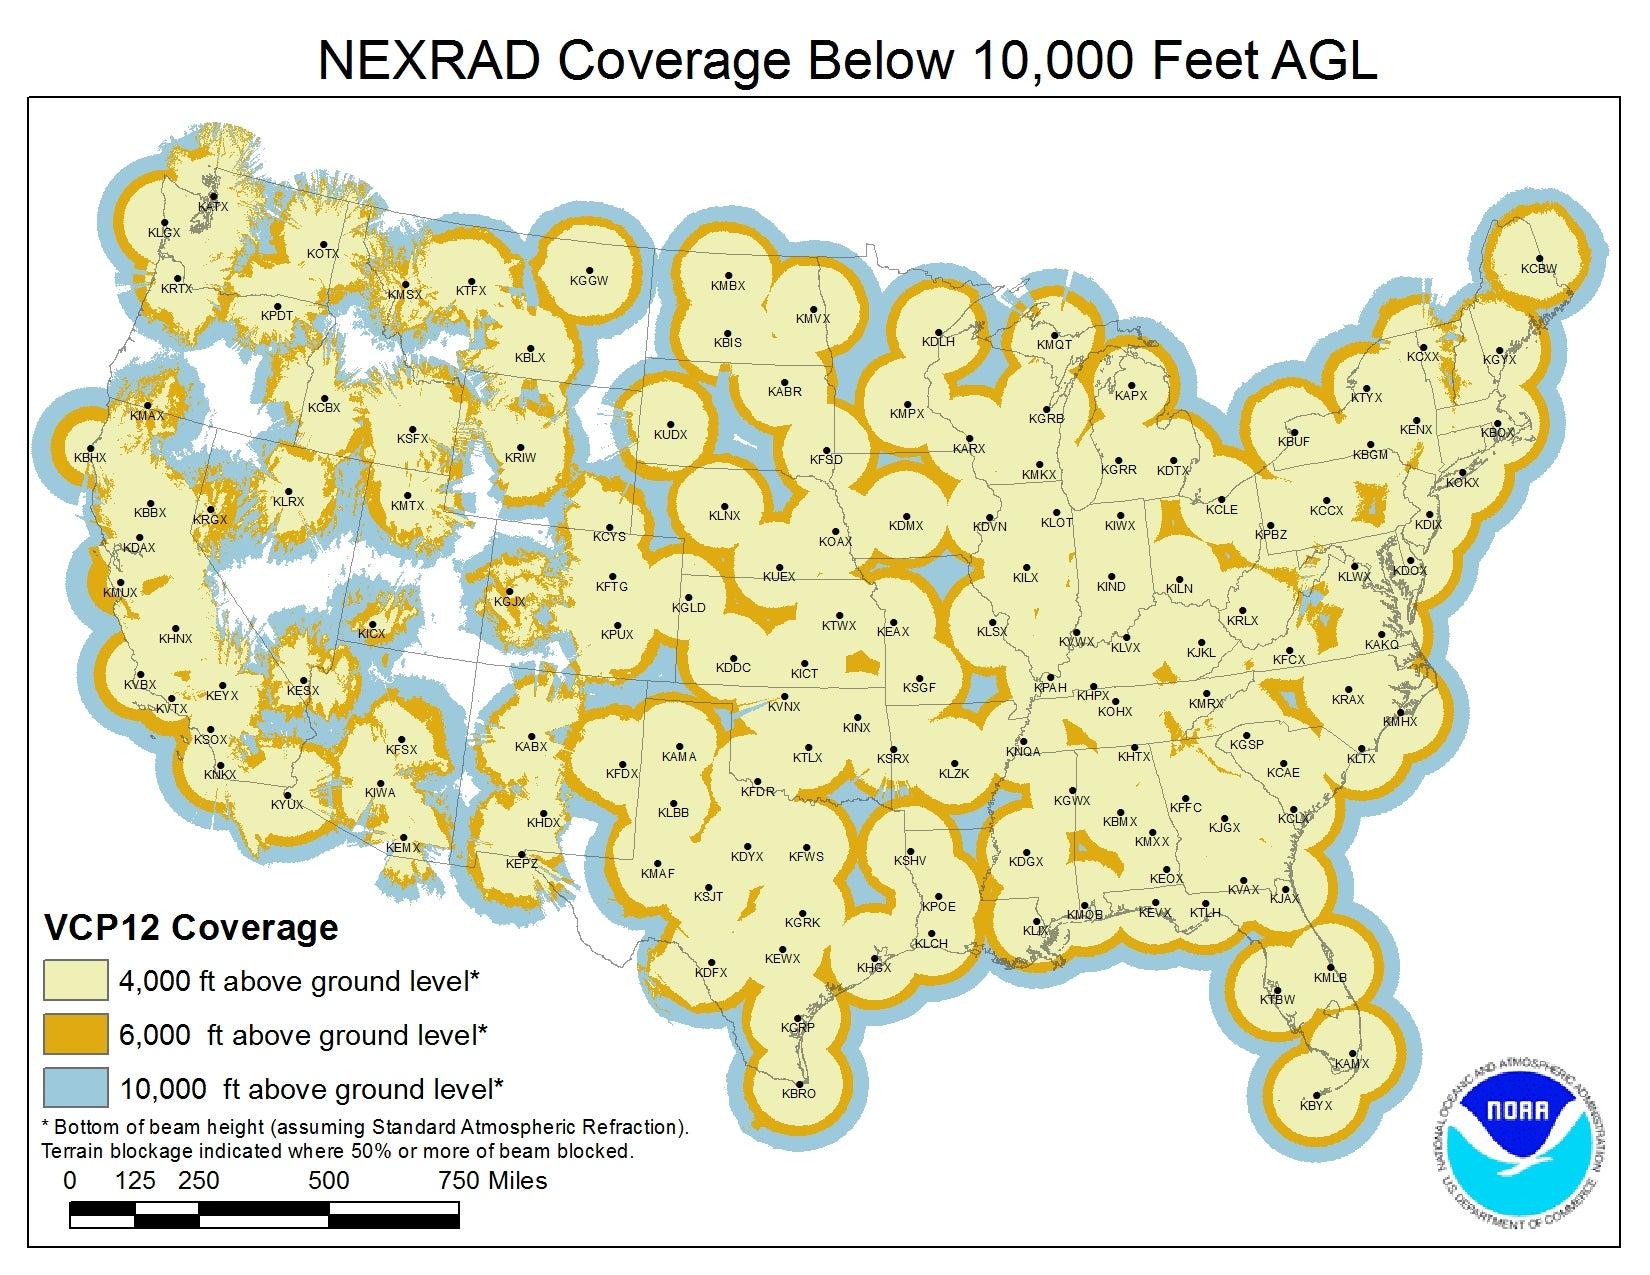 US Doppler Radar Weathercom National Weather Map Radar My Blog - Us radar map in motion